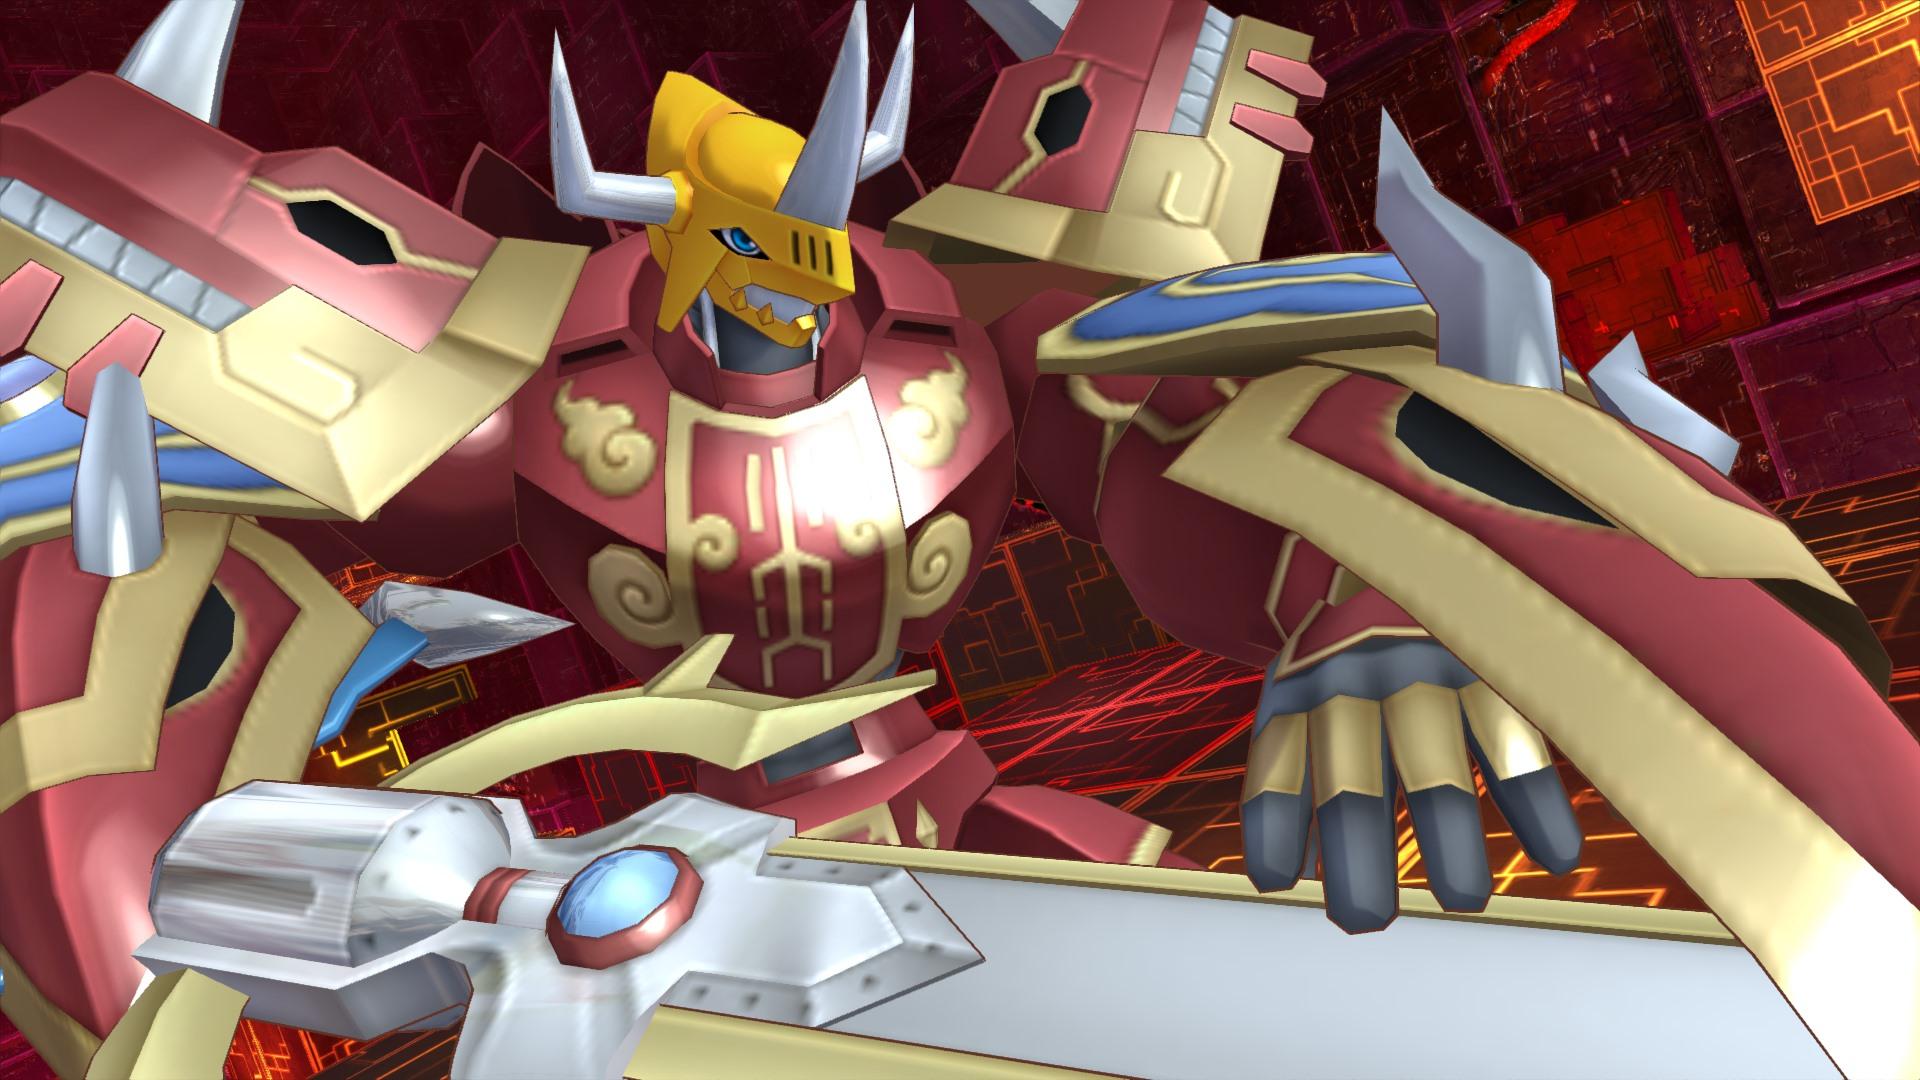 Digimon_6_1508832020